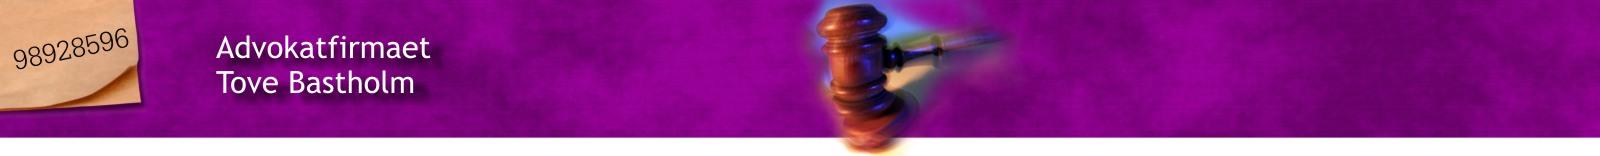 Advokatfirmaet Tove Bastholm